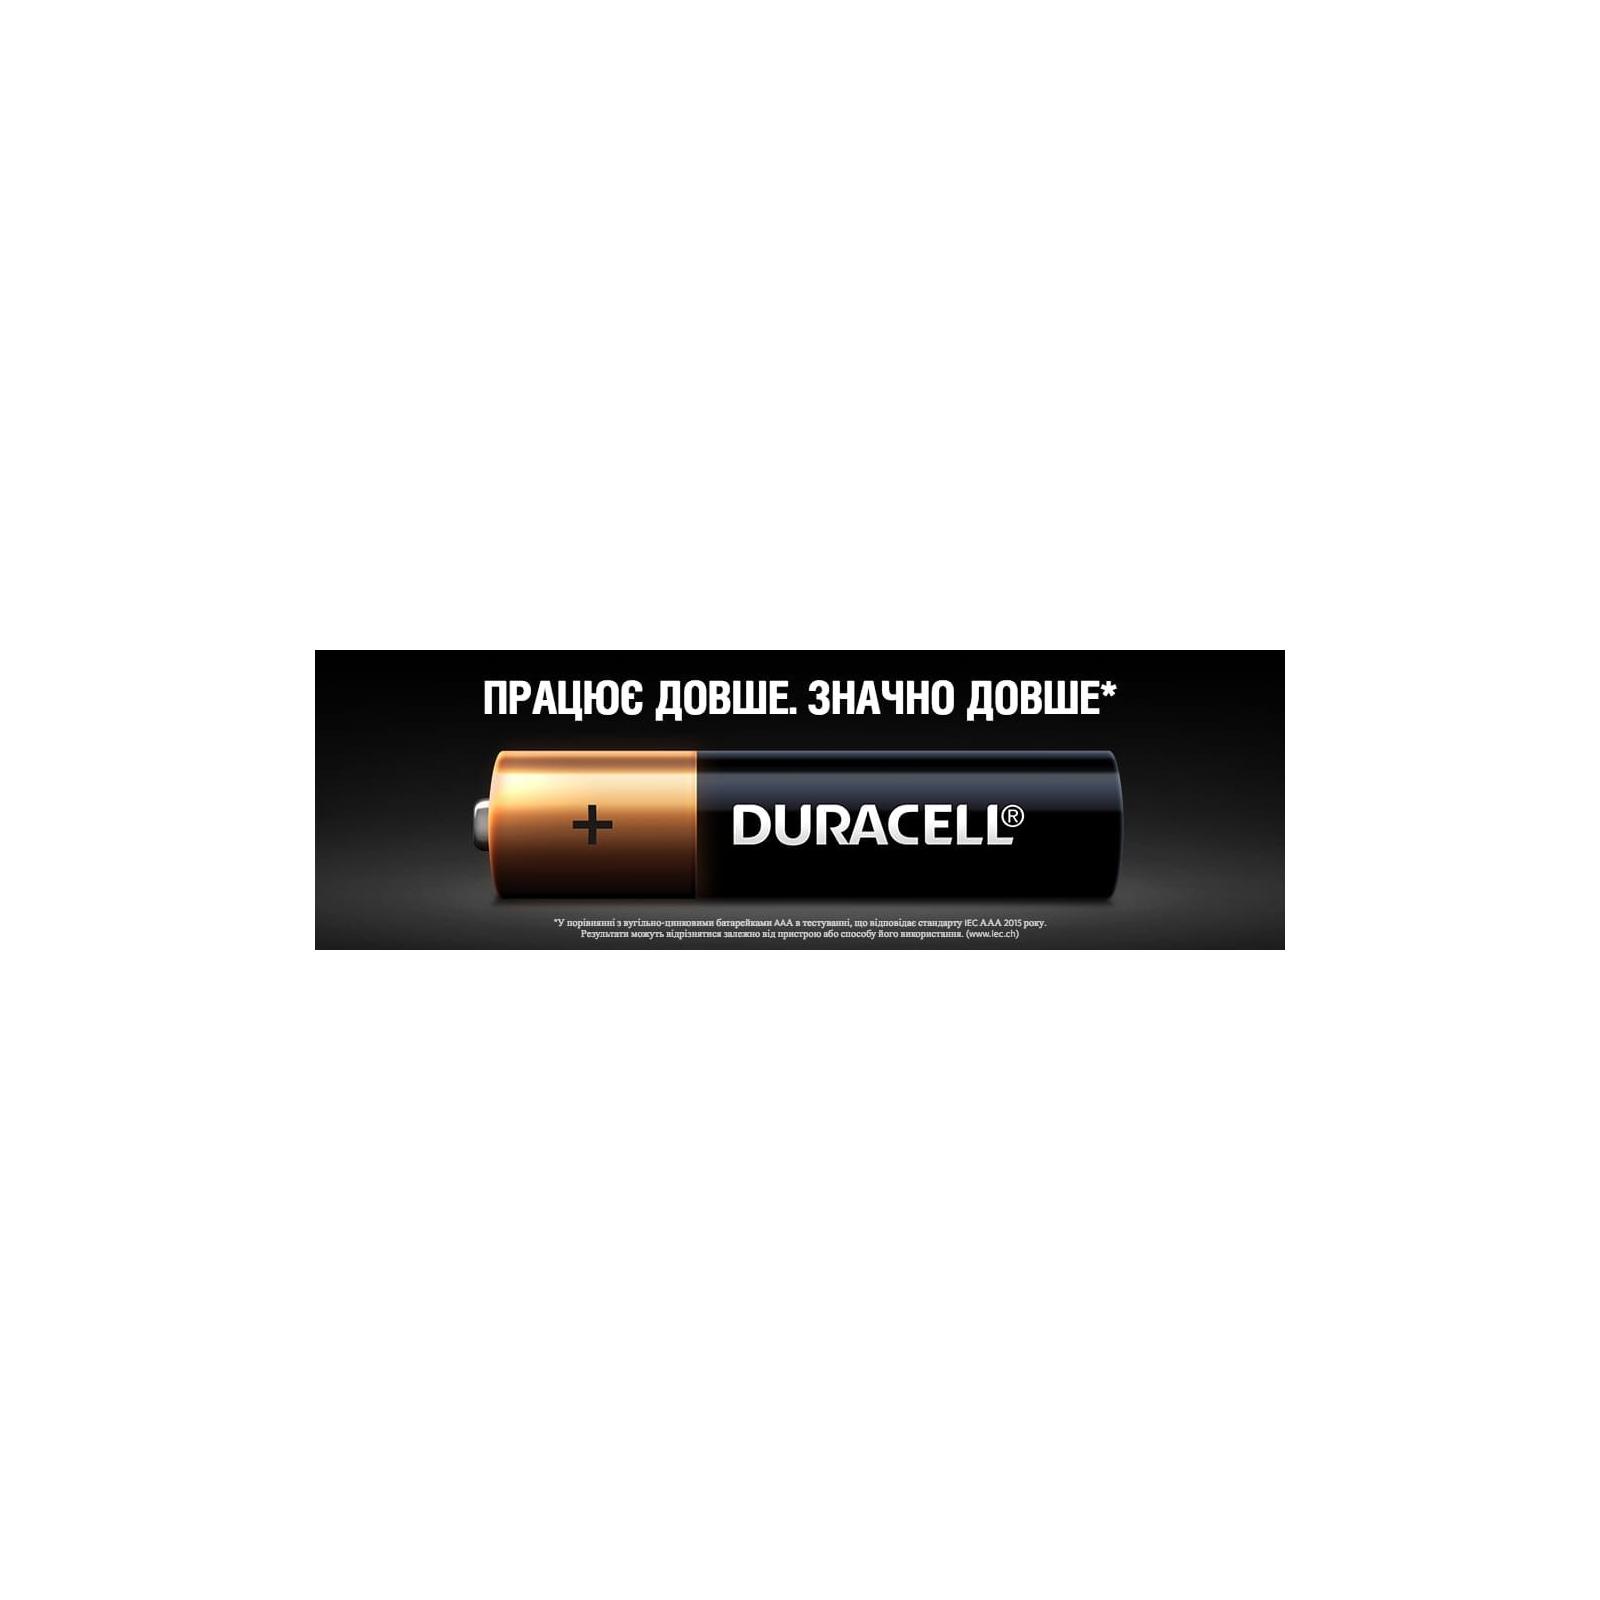 Батарейка Duracell AAA MN2400 LR03 * 4 (5000394052543 / 81545421) изображение 8